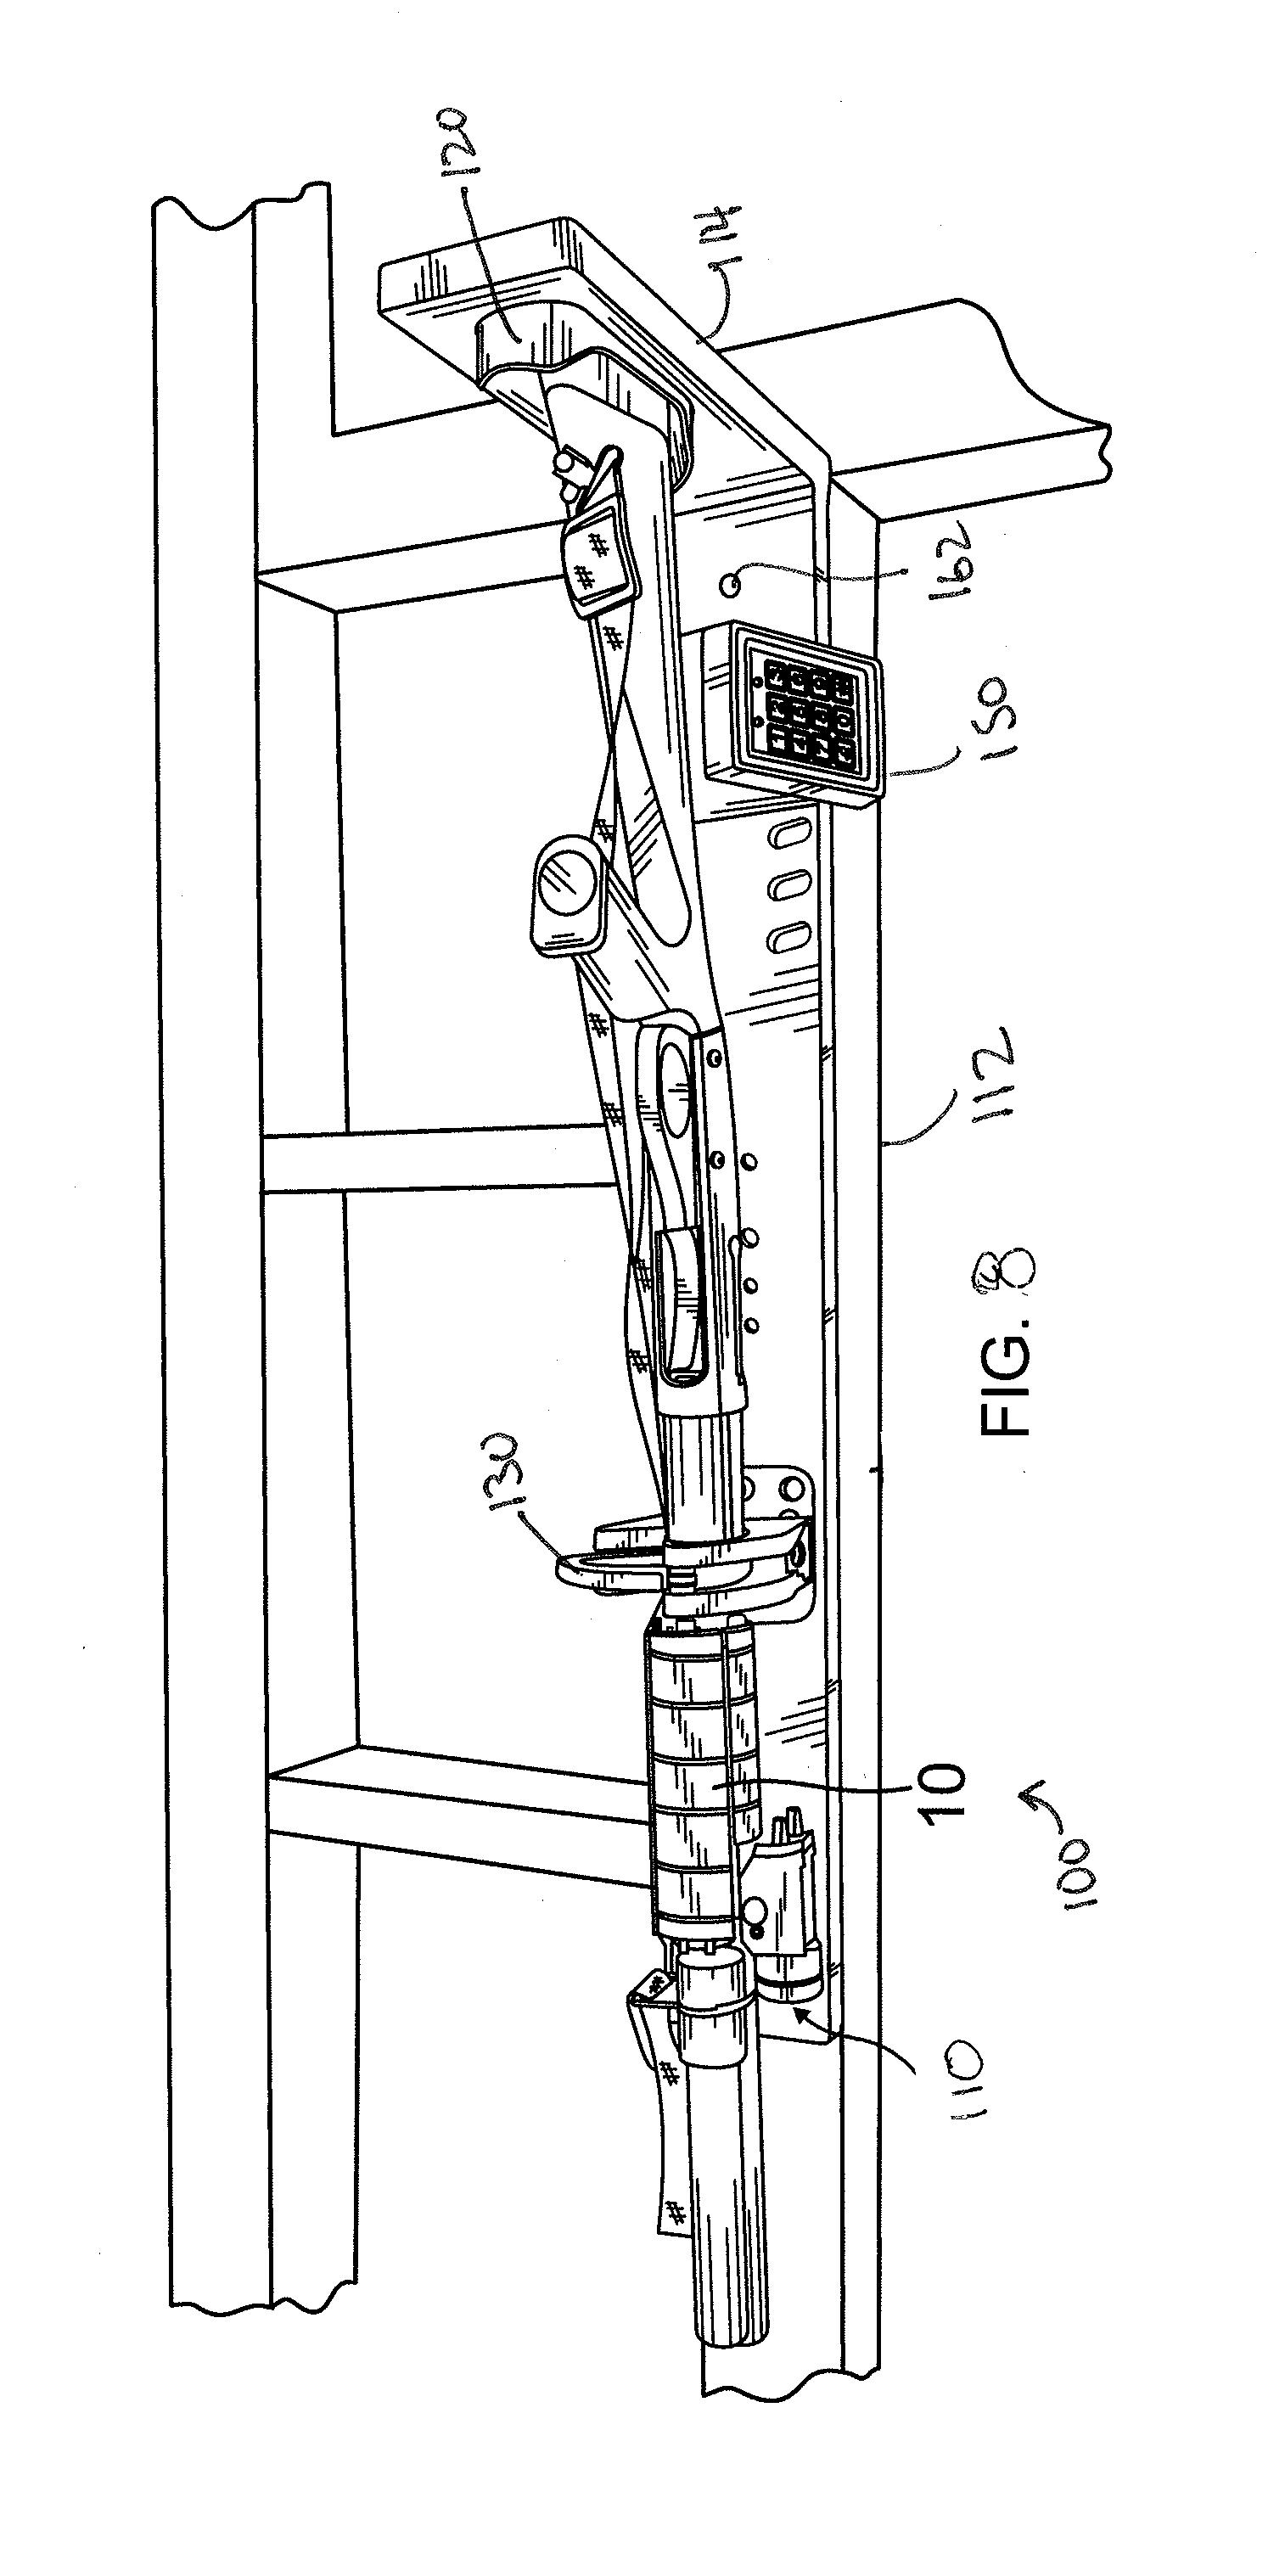 US20140263107A1 20140918 D00008 patent us20140263107 locking gun rack system with quick pro gard gun lock timer wiring diagram at reclaimingppi.co